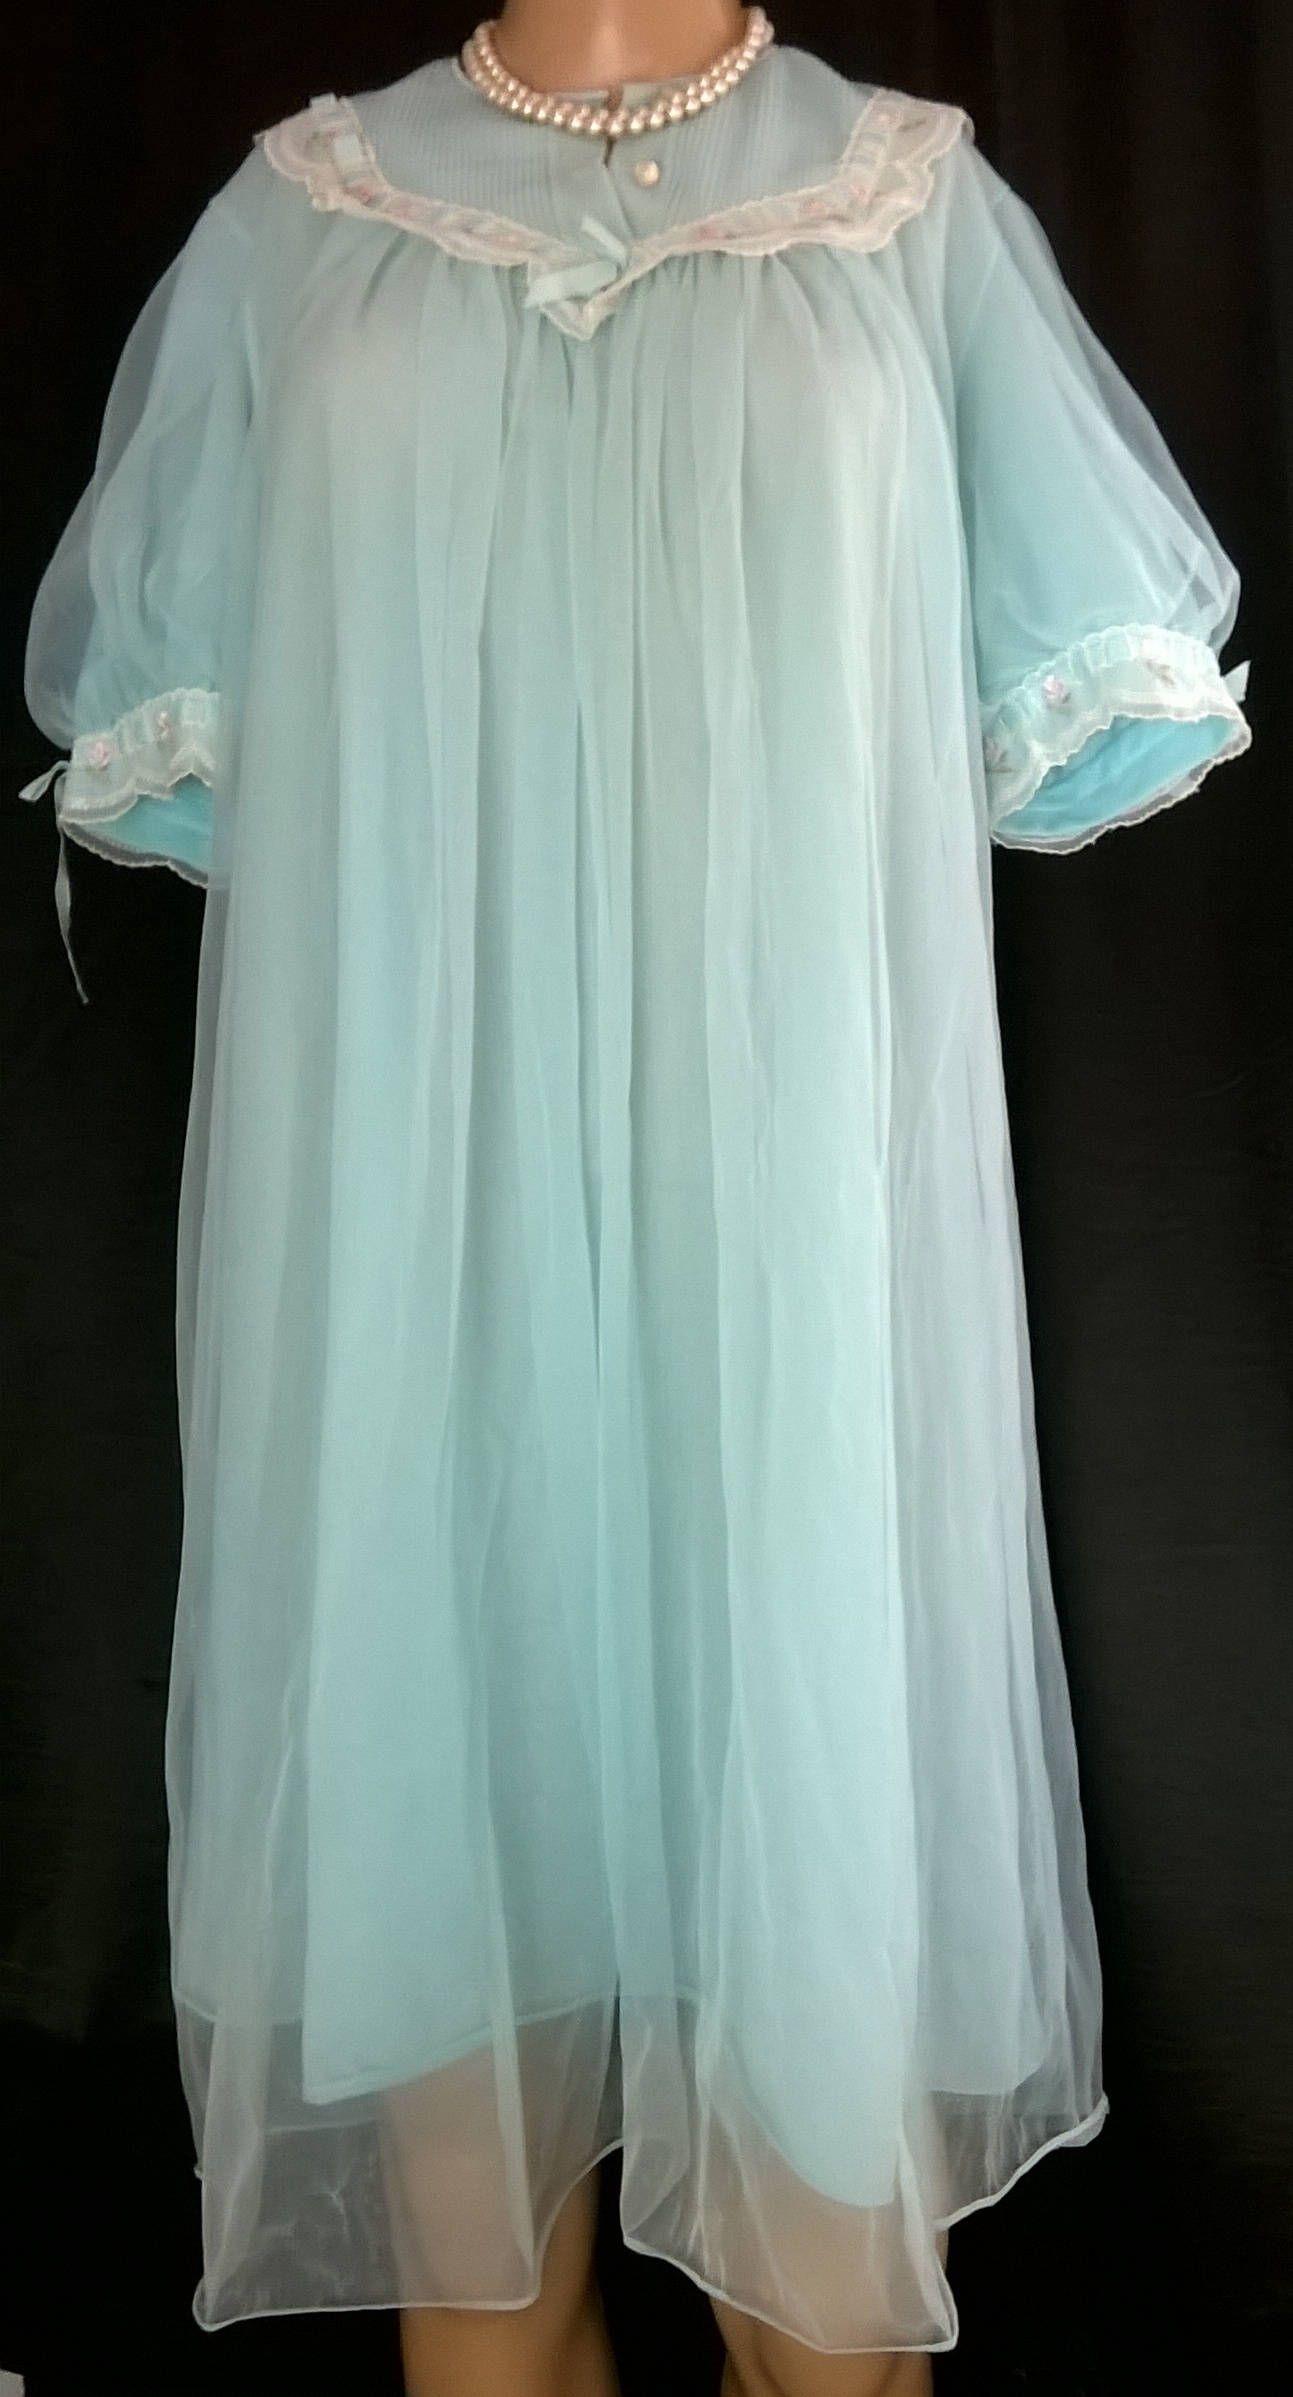 Vintage Blue Negligee 1960s Bri-Nylon Peignoir Nightie Vintage Lingerie 60s Double  Layered Robe St Michael Nightdress Size 34 36